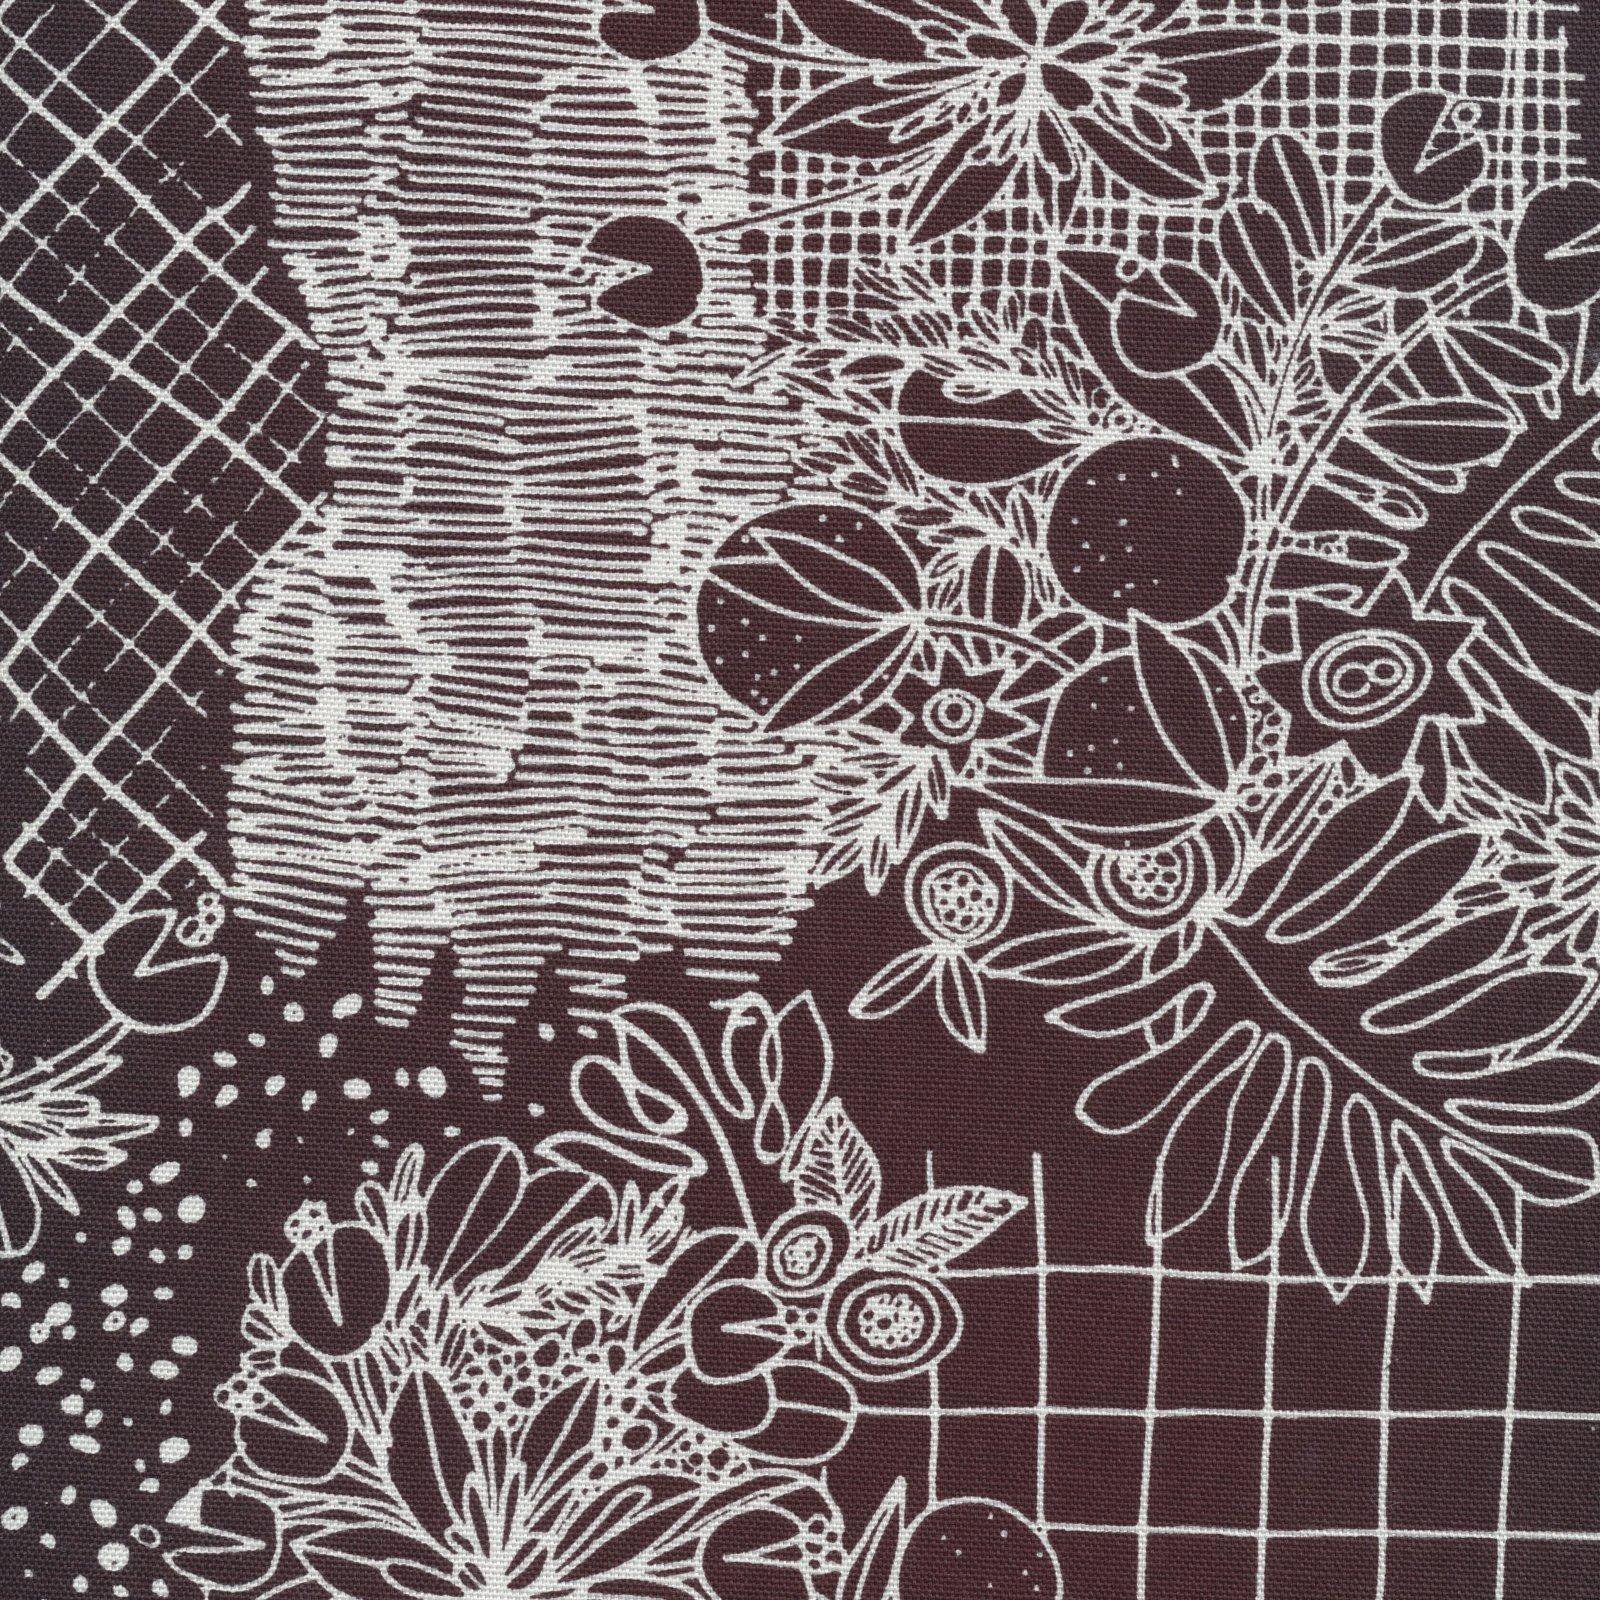 Terrestrial- Overgrowth- Sarah Watson- Cloud 9 Fabrics